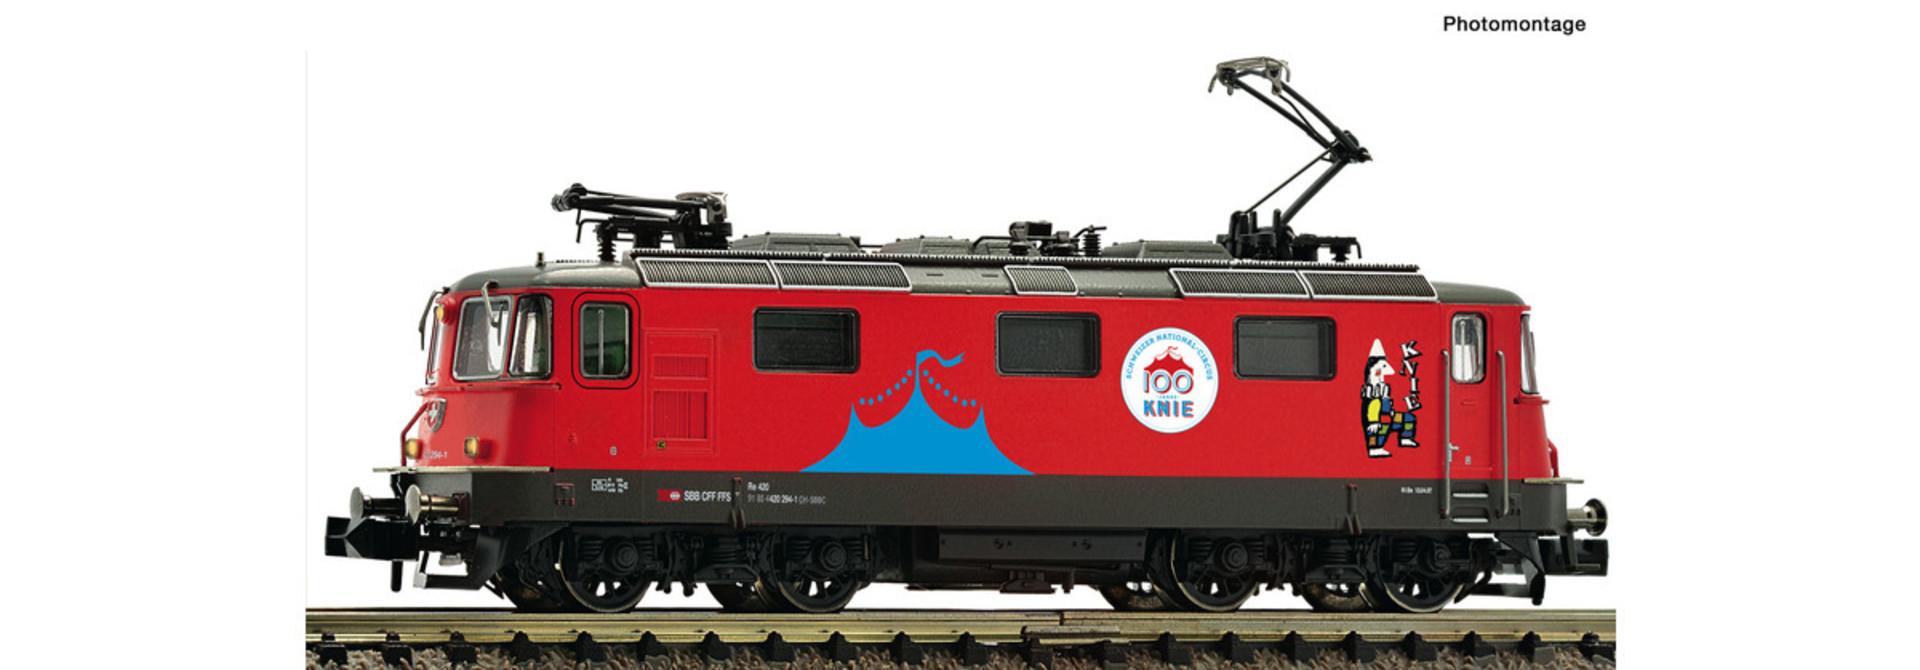 734014 E-Lok 420 294 SBB Knie